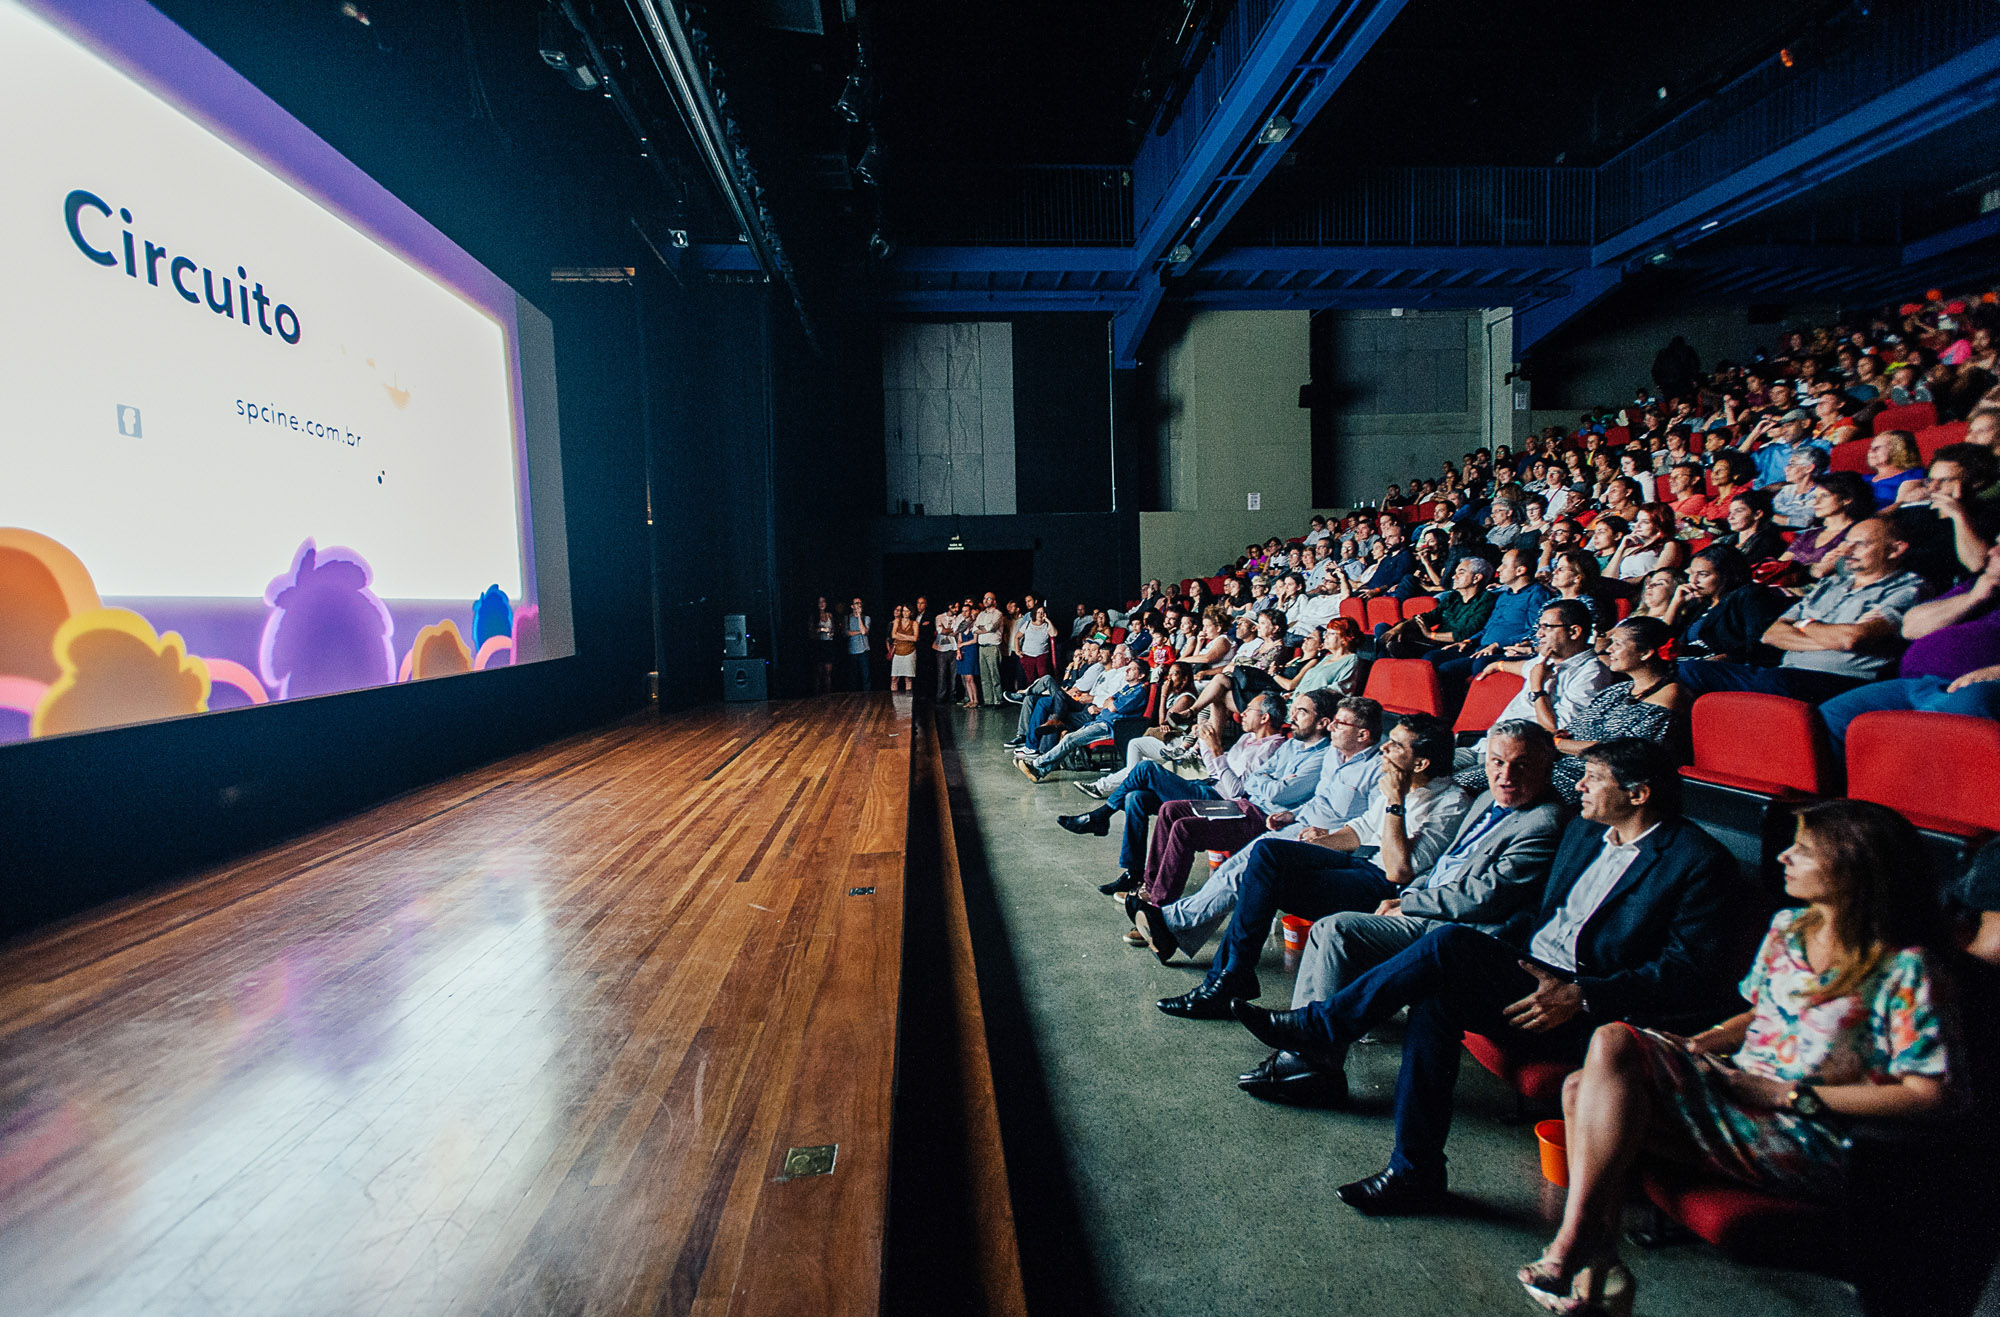 Circuito Sp Cine : Cabine pipoca] circuito spcine oferece cinema gratuito para todos os